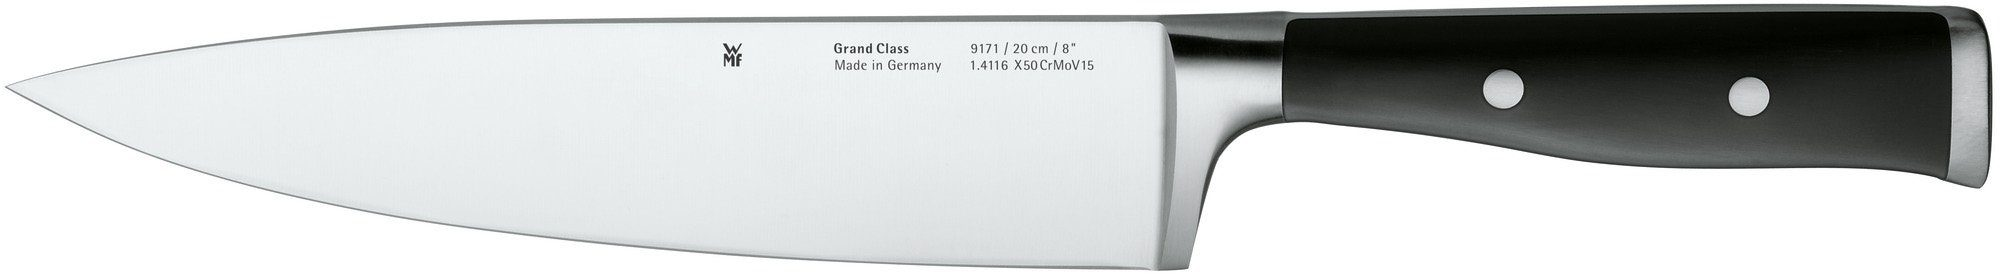 WMF Kochmesser, 20 cm, »GRAND CLASS«